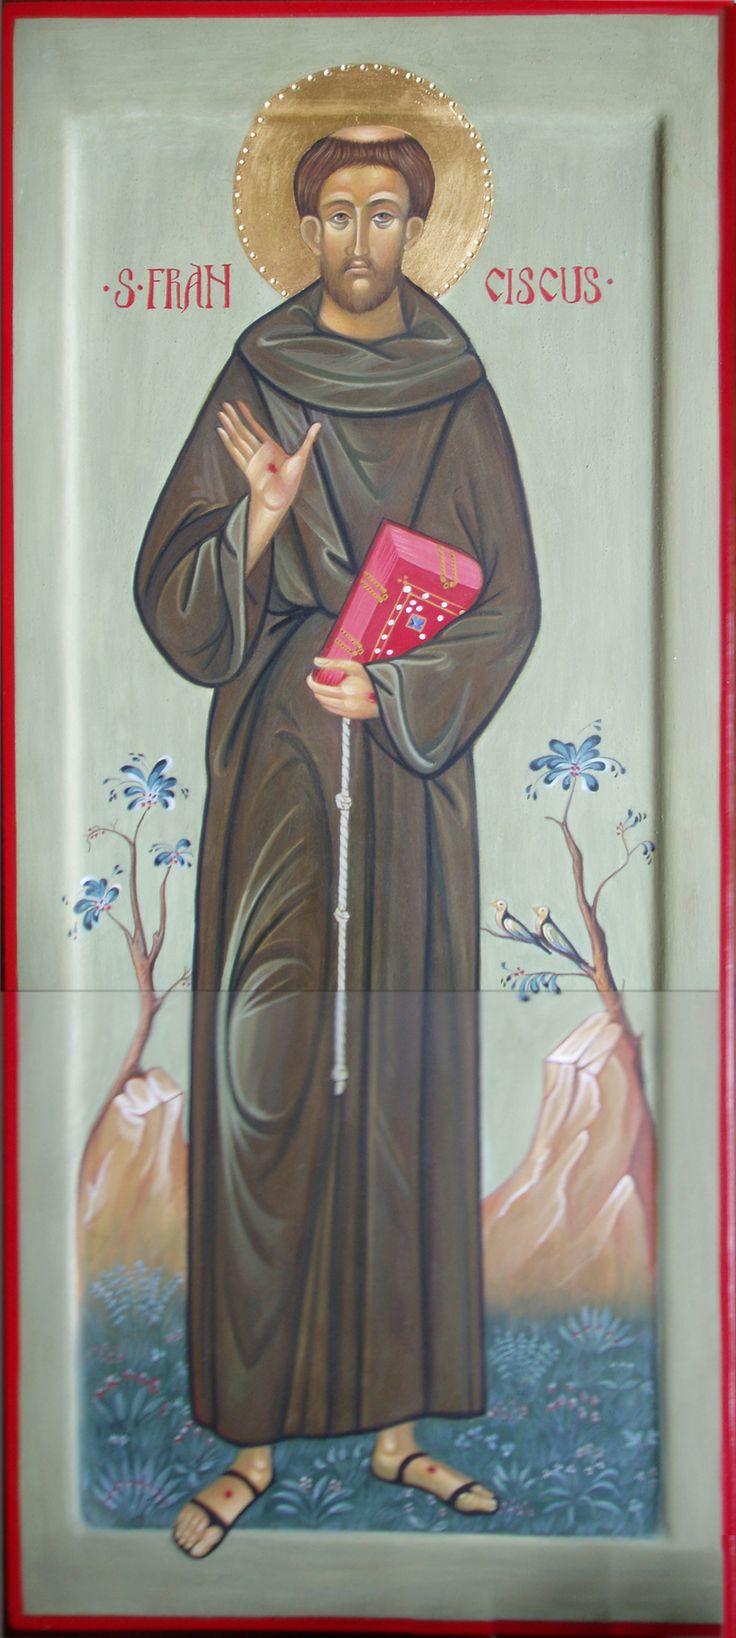 San Francesco d'Assisi per manodi Maria Marciandi (Italy)